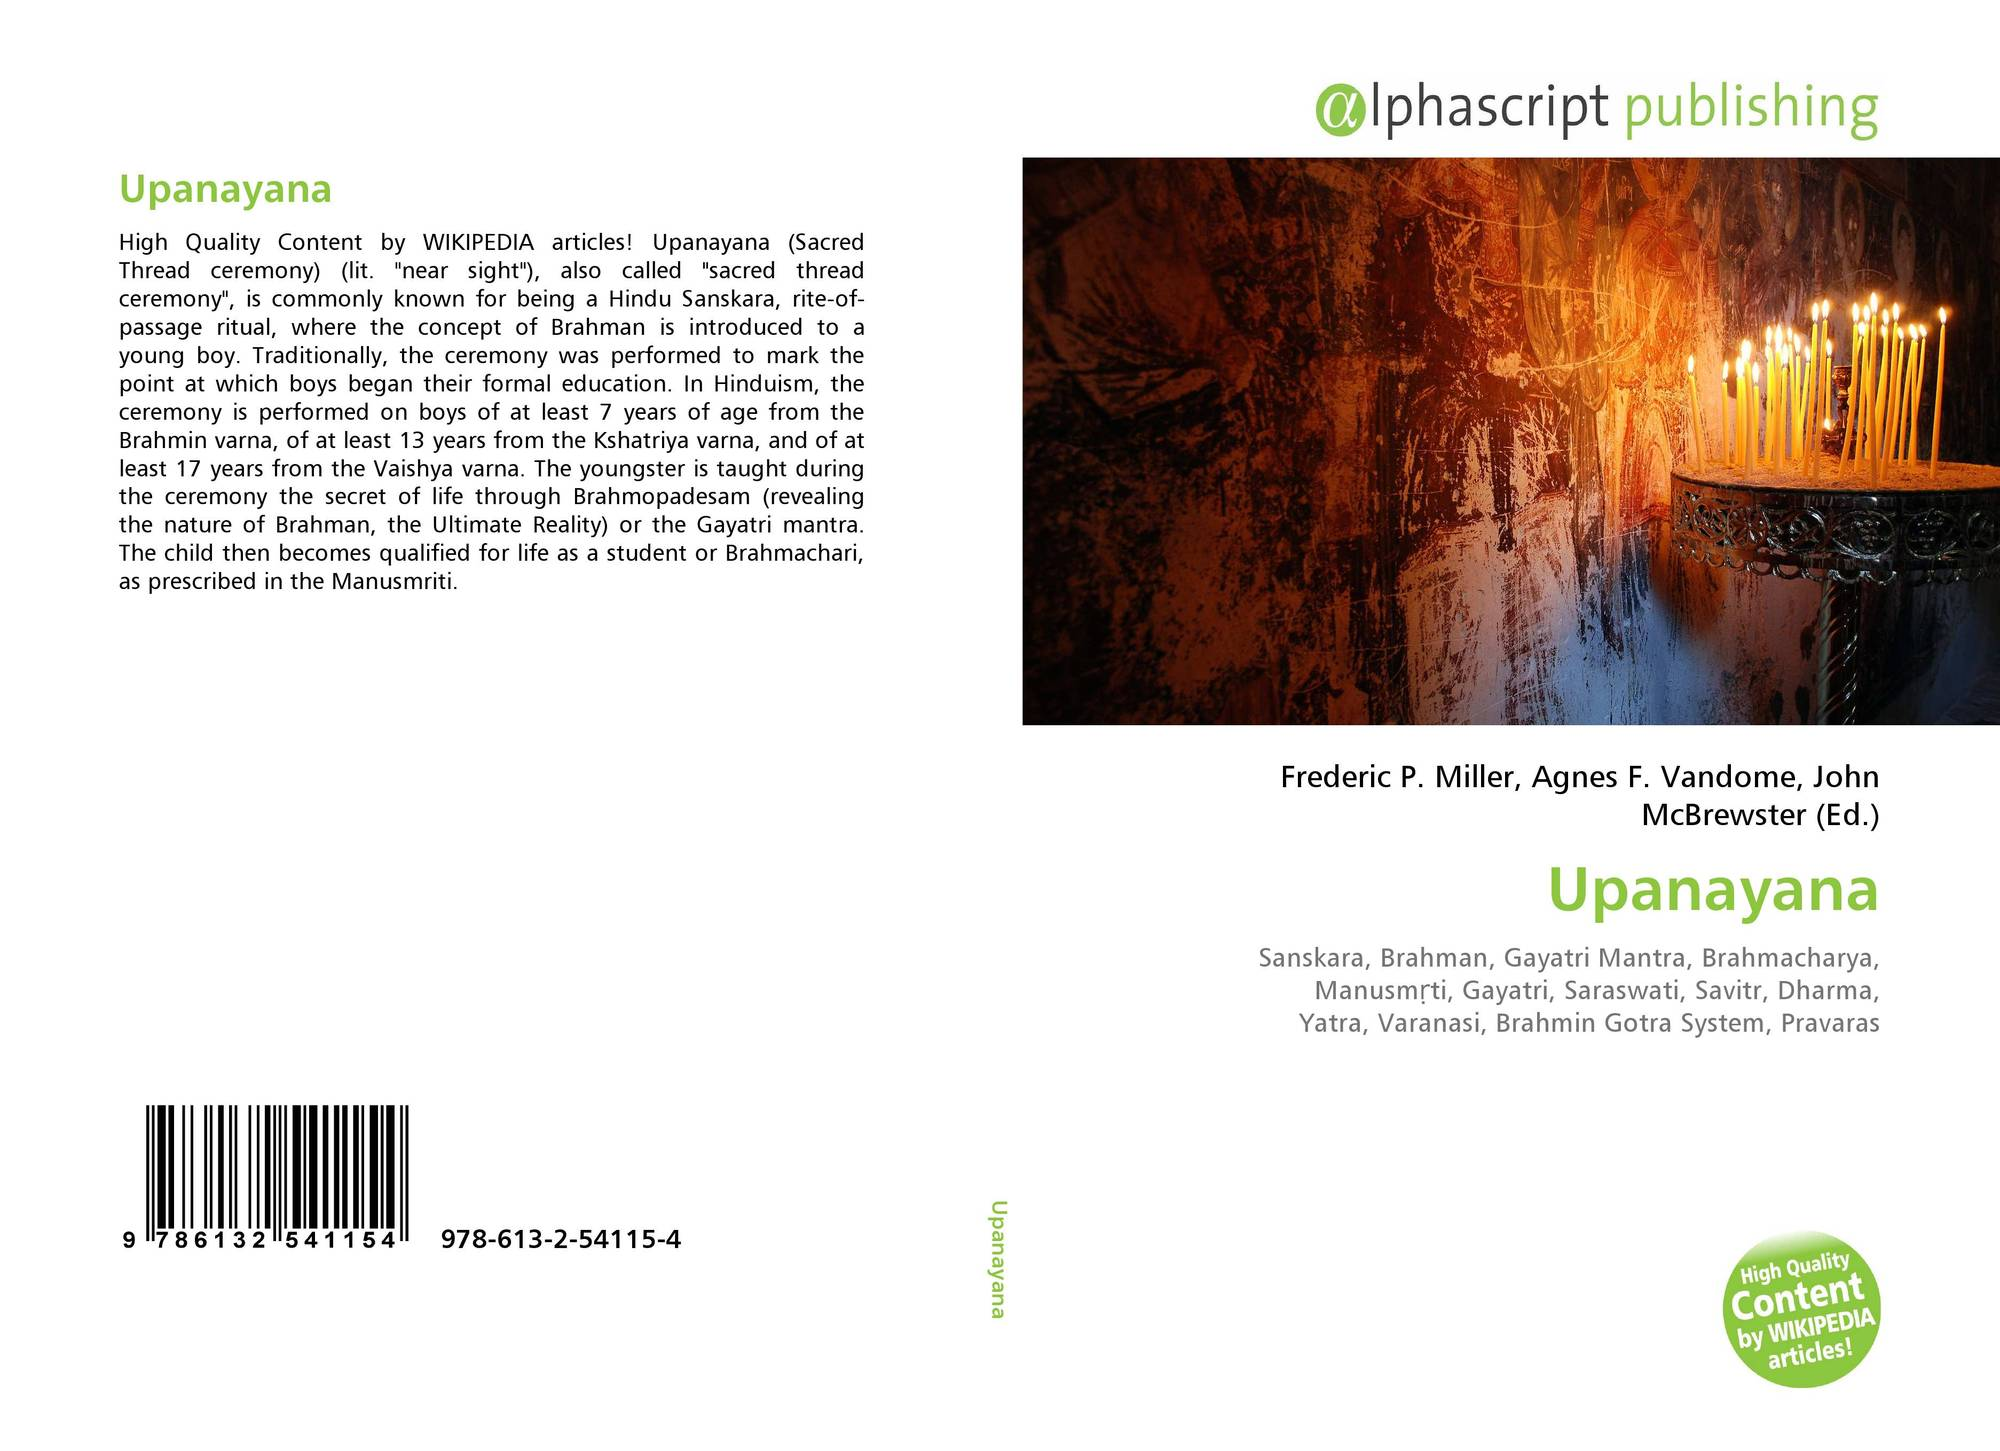 Upanayana, 978-613-2-54115-4, 6132541152 ,9786132541154